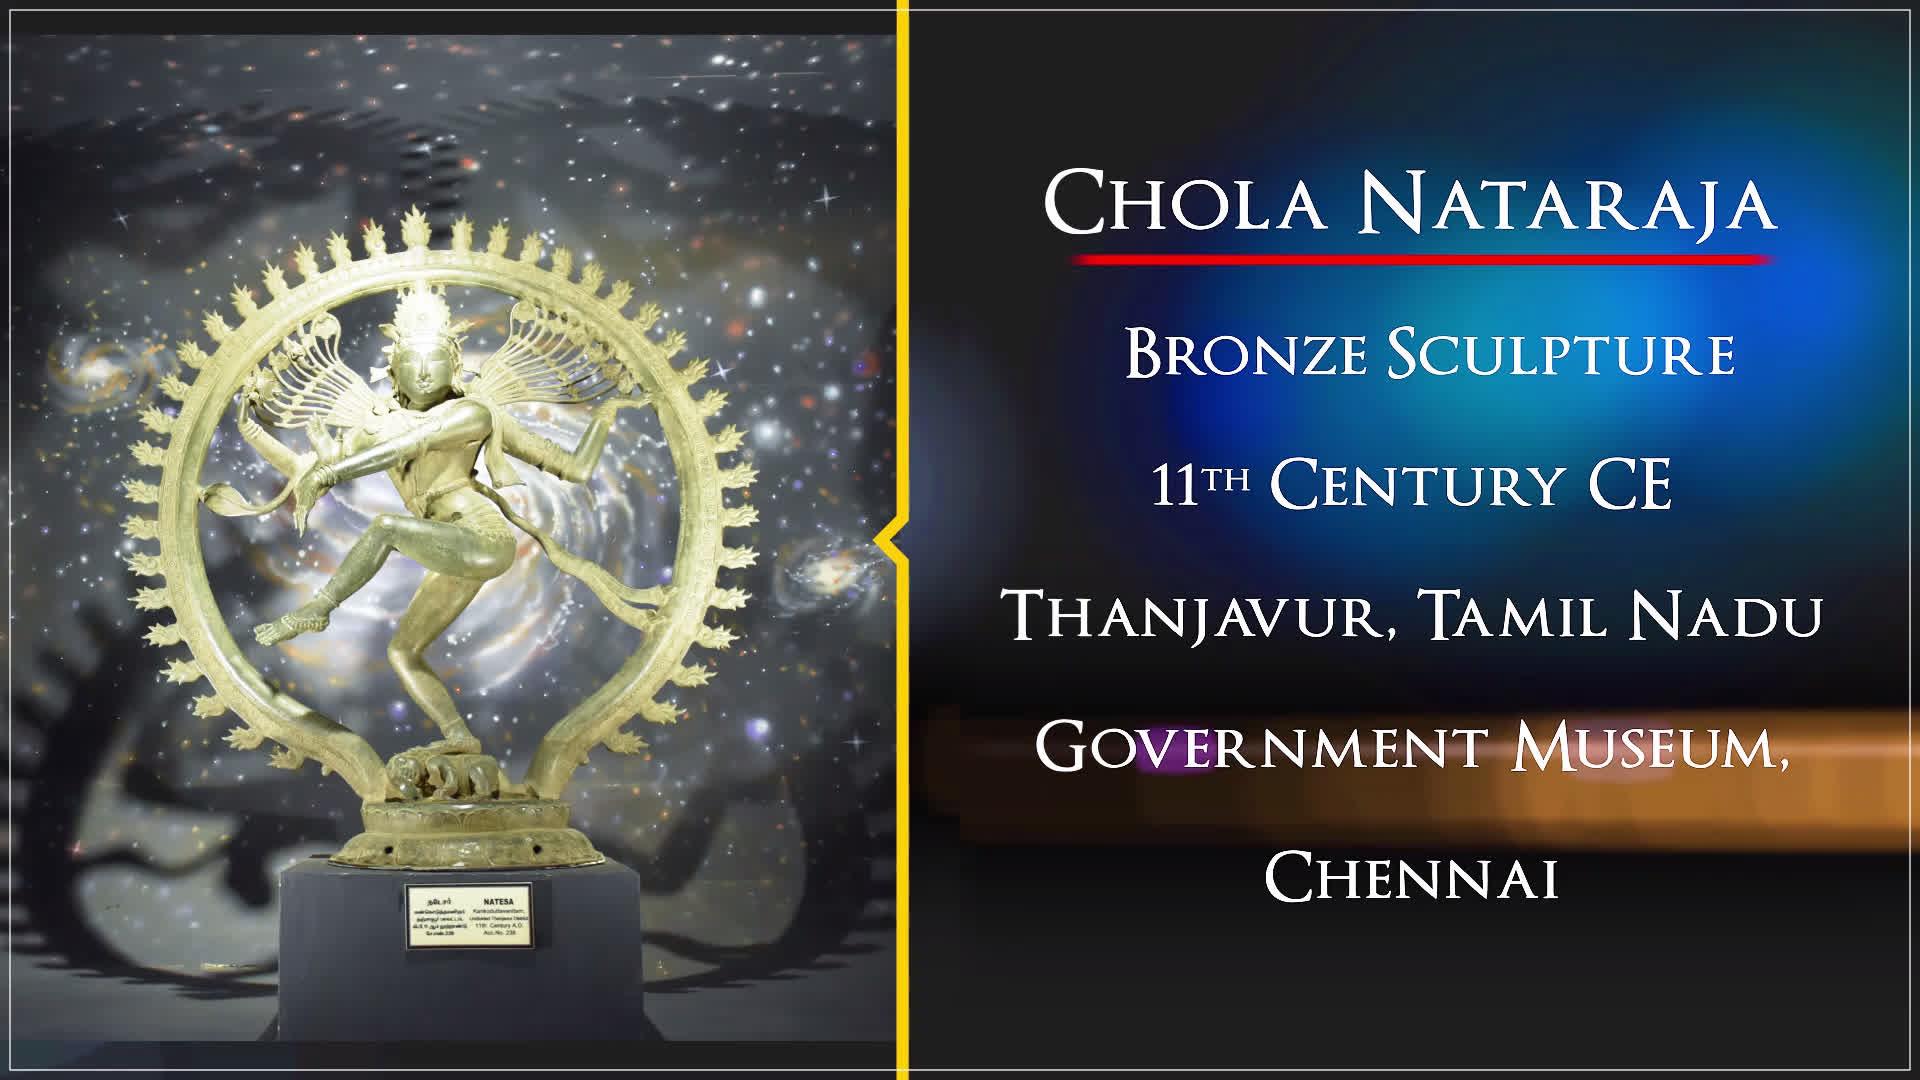 Chola Nataraja | Treasures of India